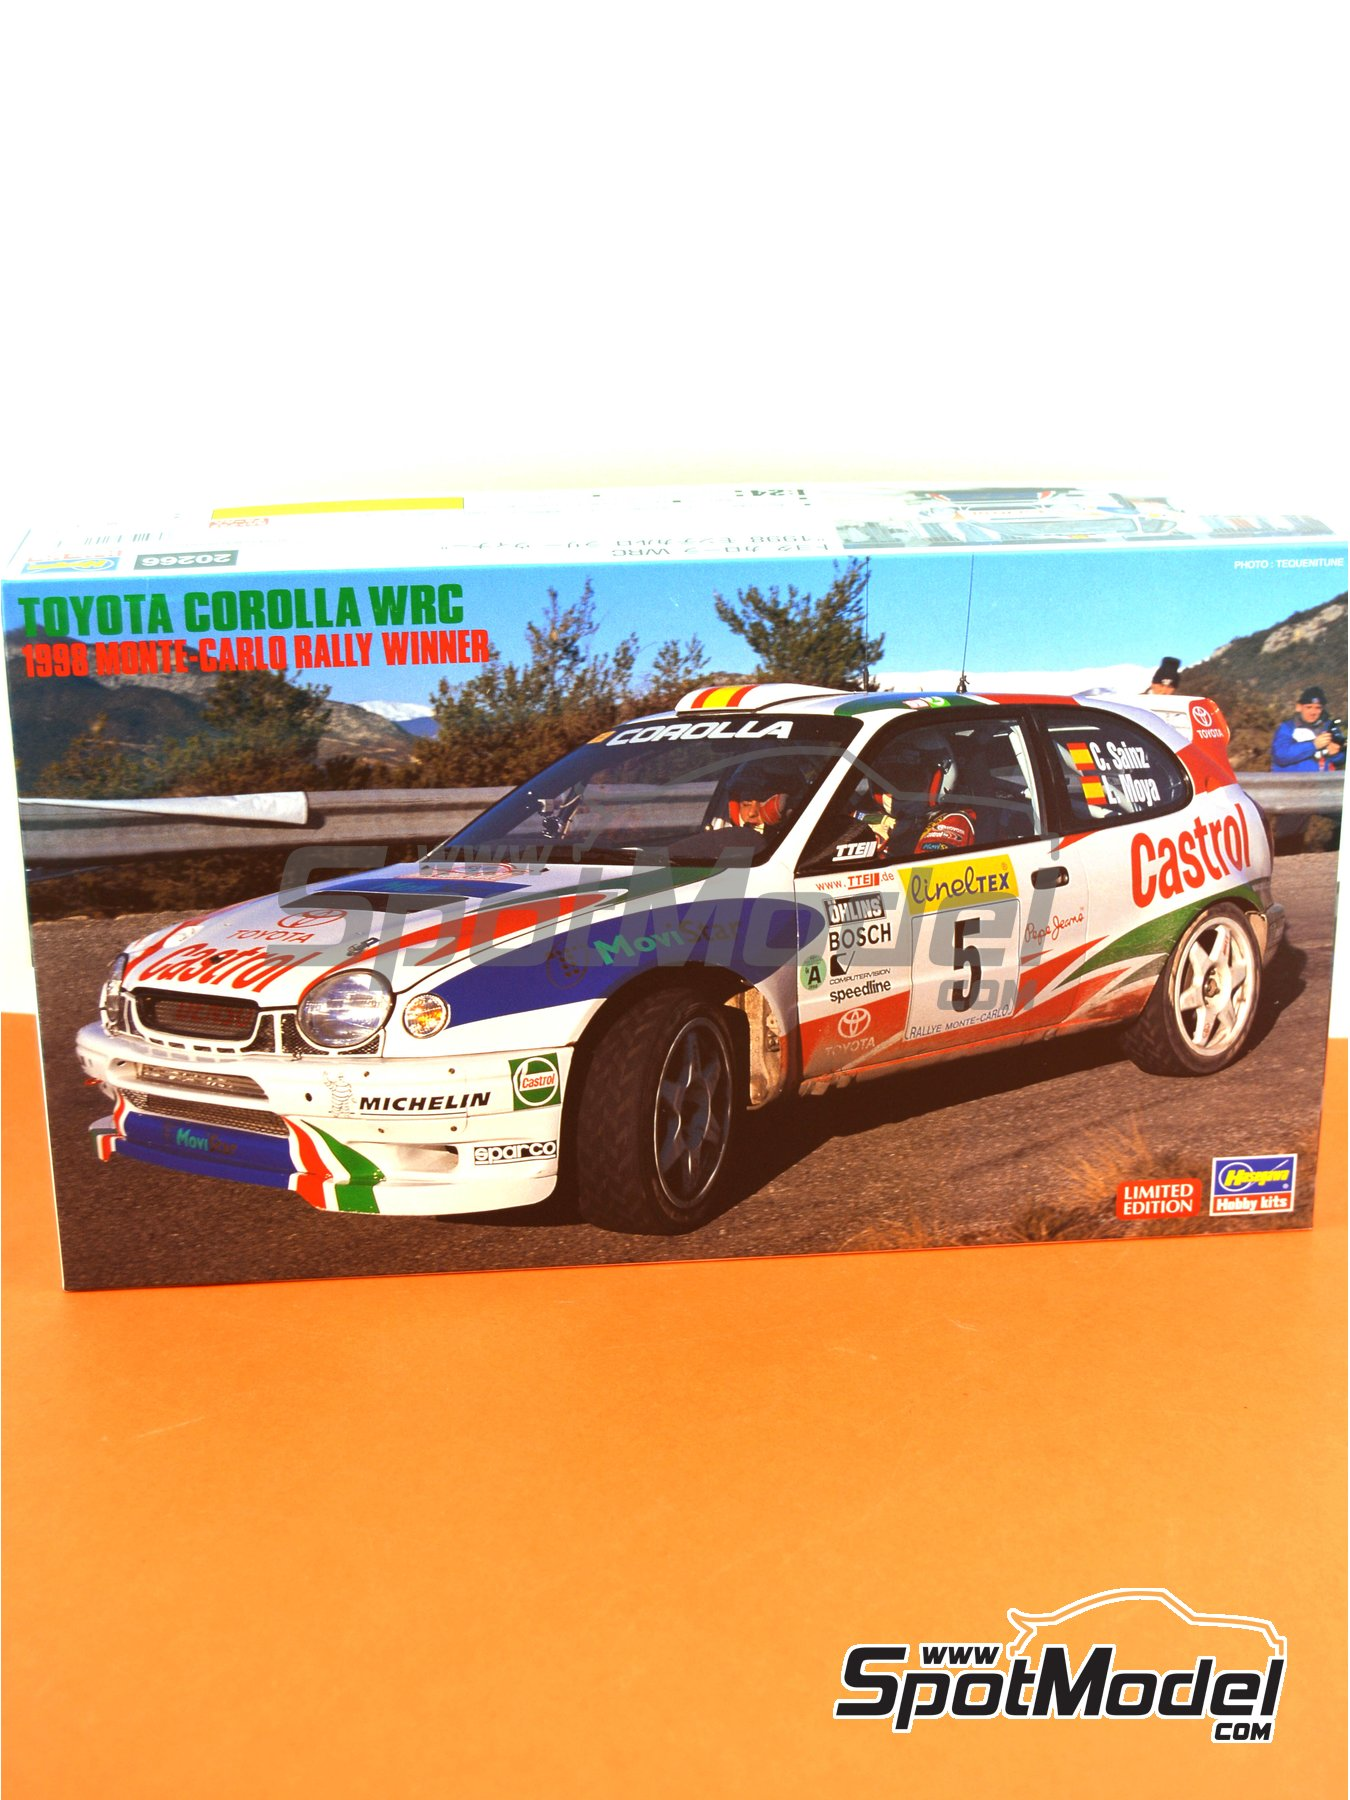 Toyota Corolla WRC Castrol Movistar - Rally de Montecarlo 1998 | Maqueta de coche en escala1/24 fabricado por Hasegawa (ref.20266) image